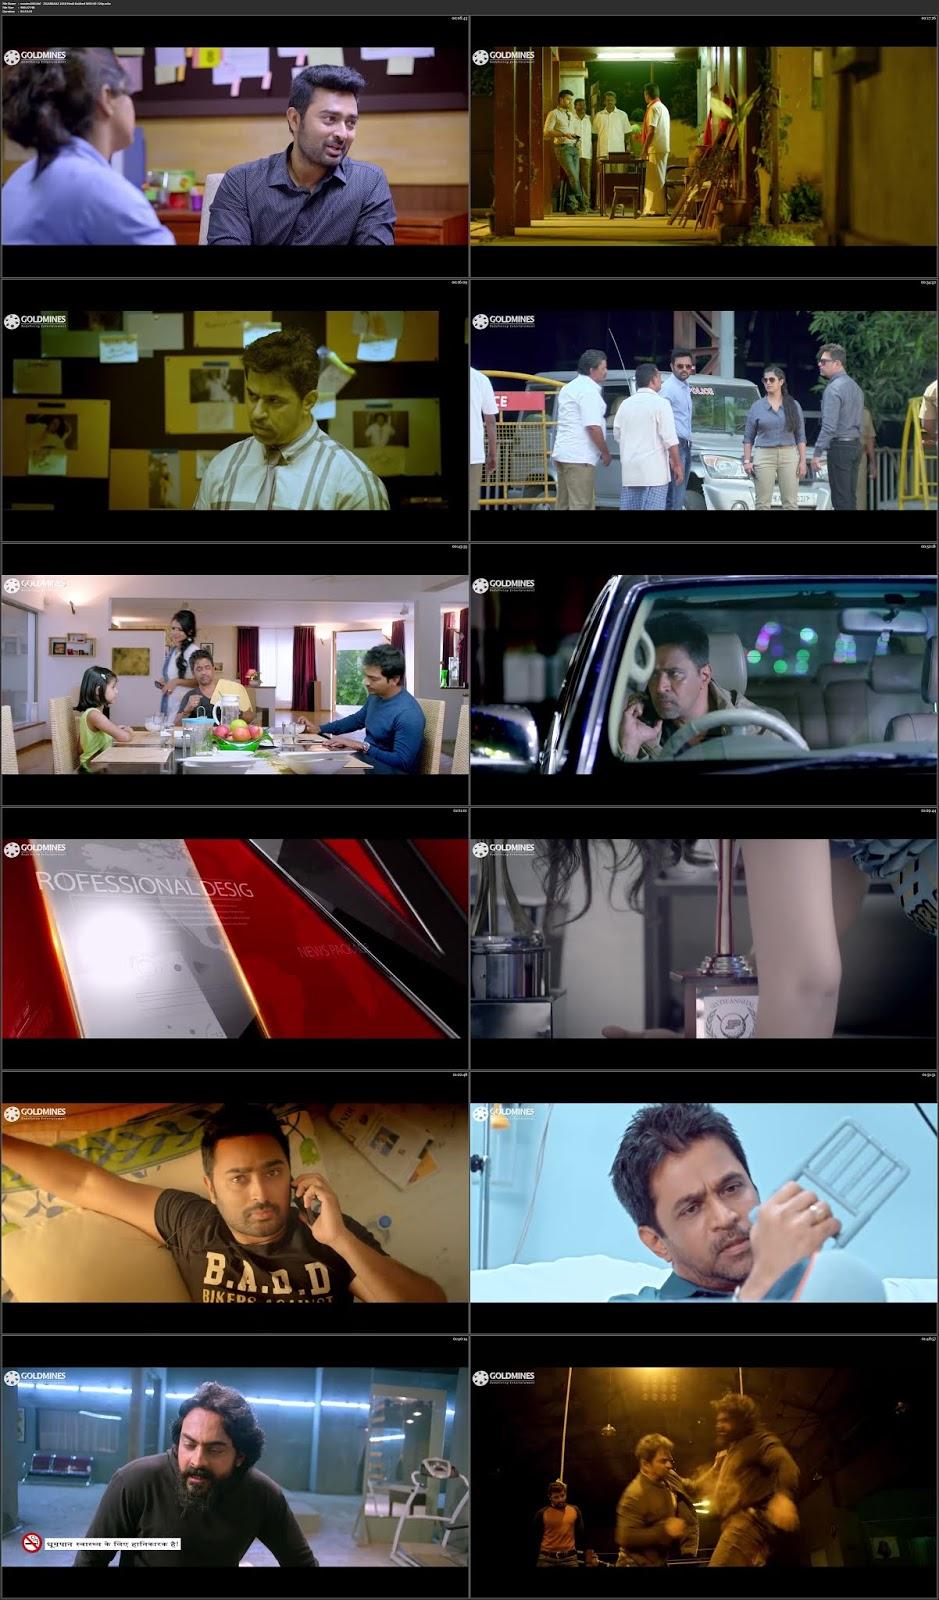 Jigarbaaz 2018 Hindi Dubbed Full Movie WEB Dl 720p